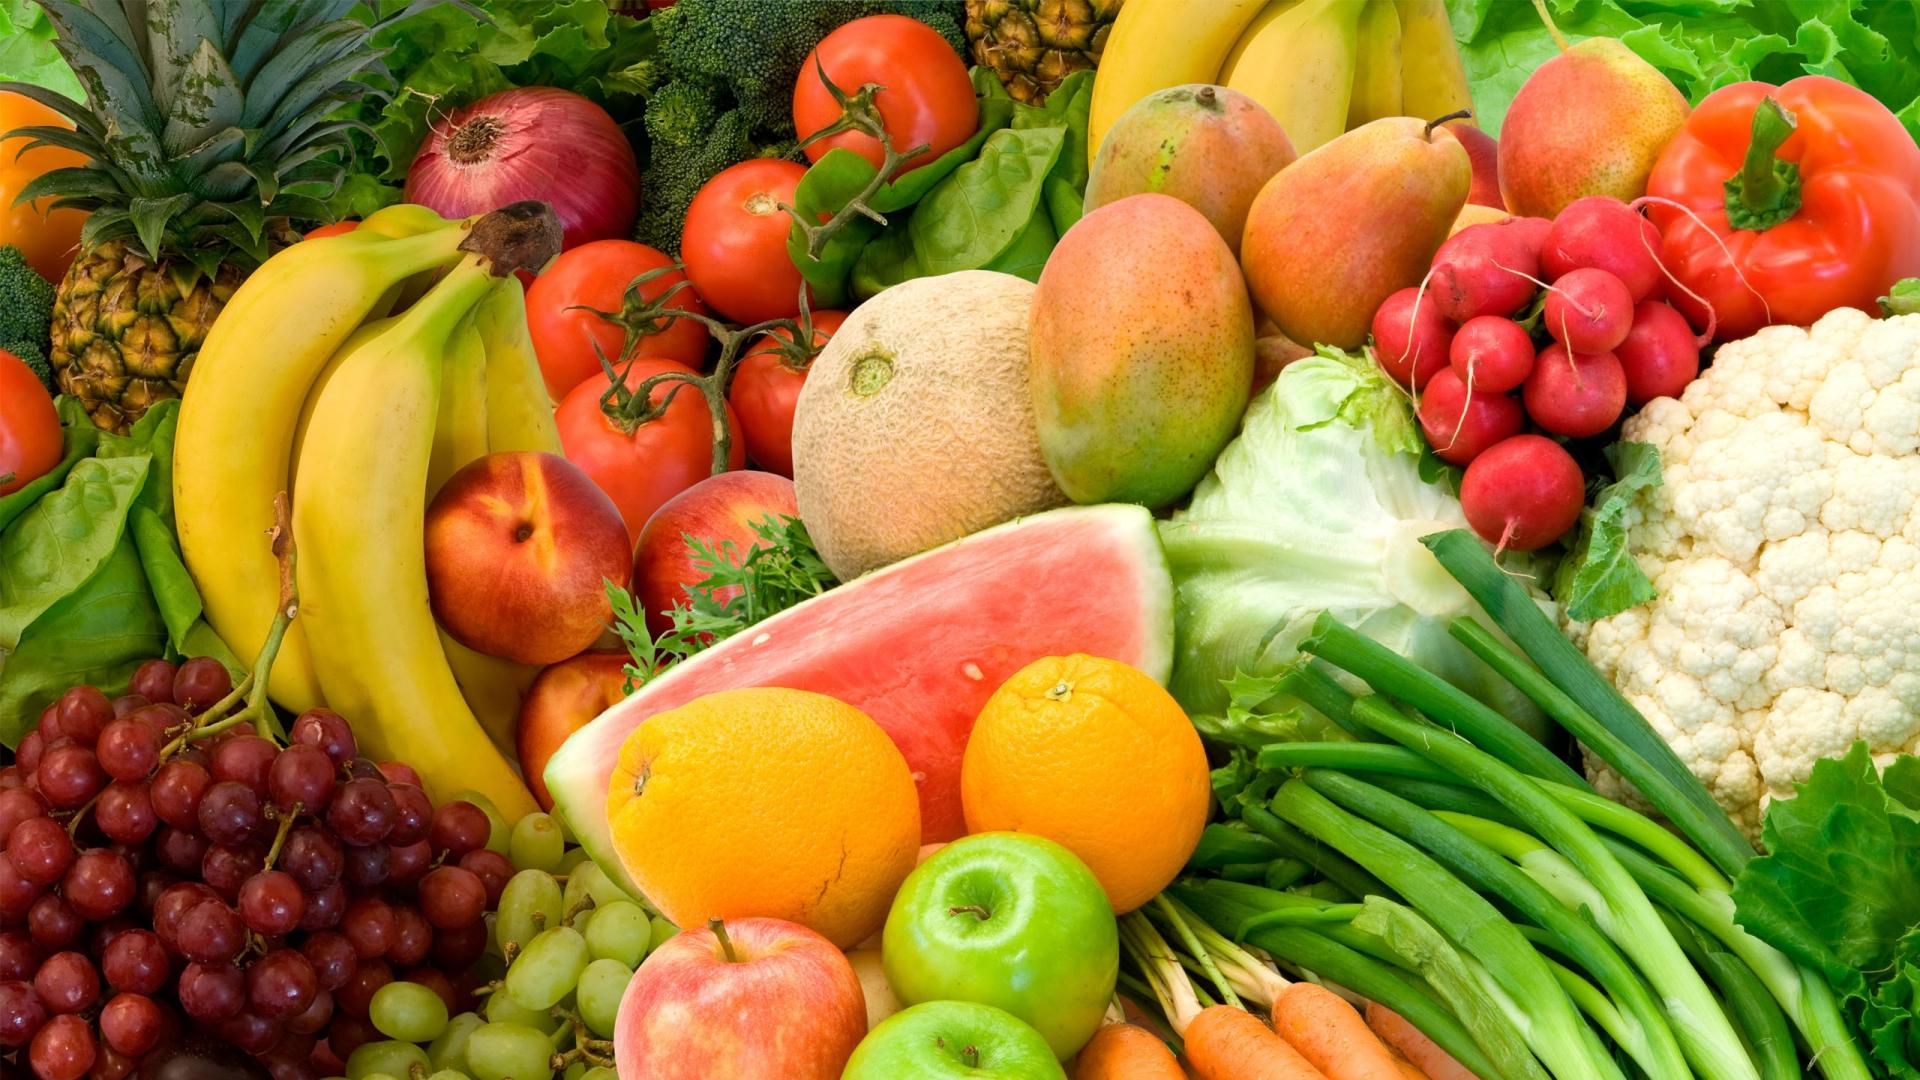 Fruits & Vegetables Wallpapers 2 - 1920 X 1080 | stmed.net